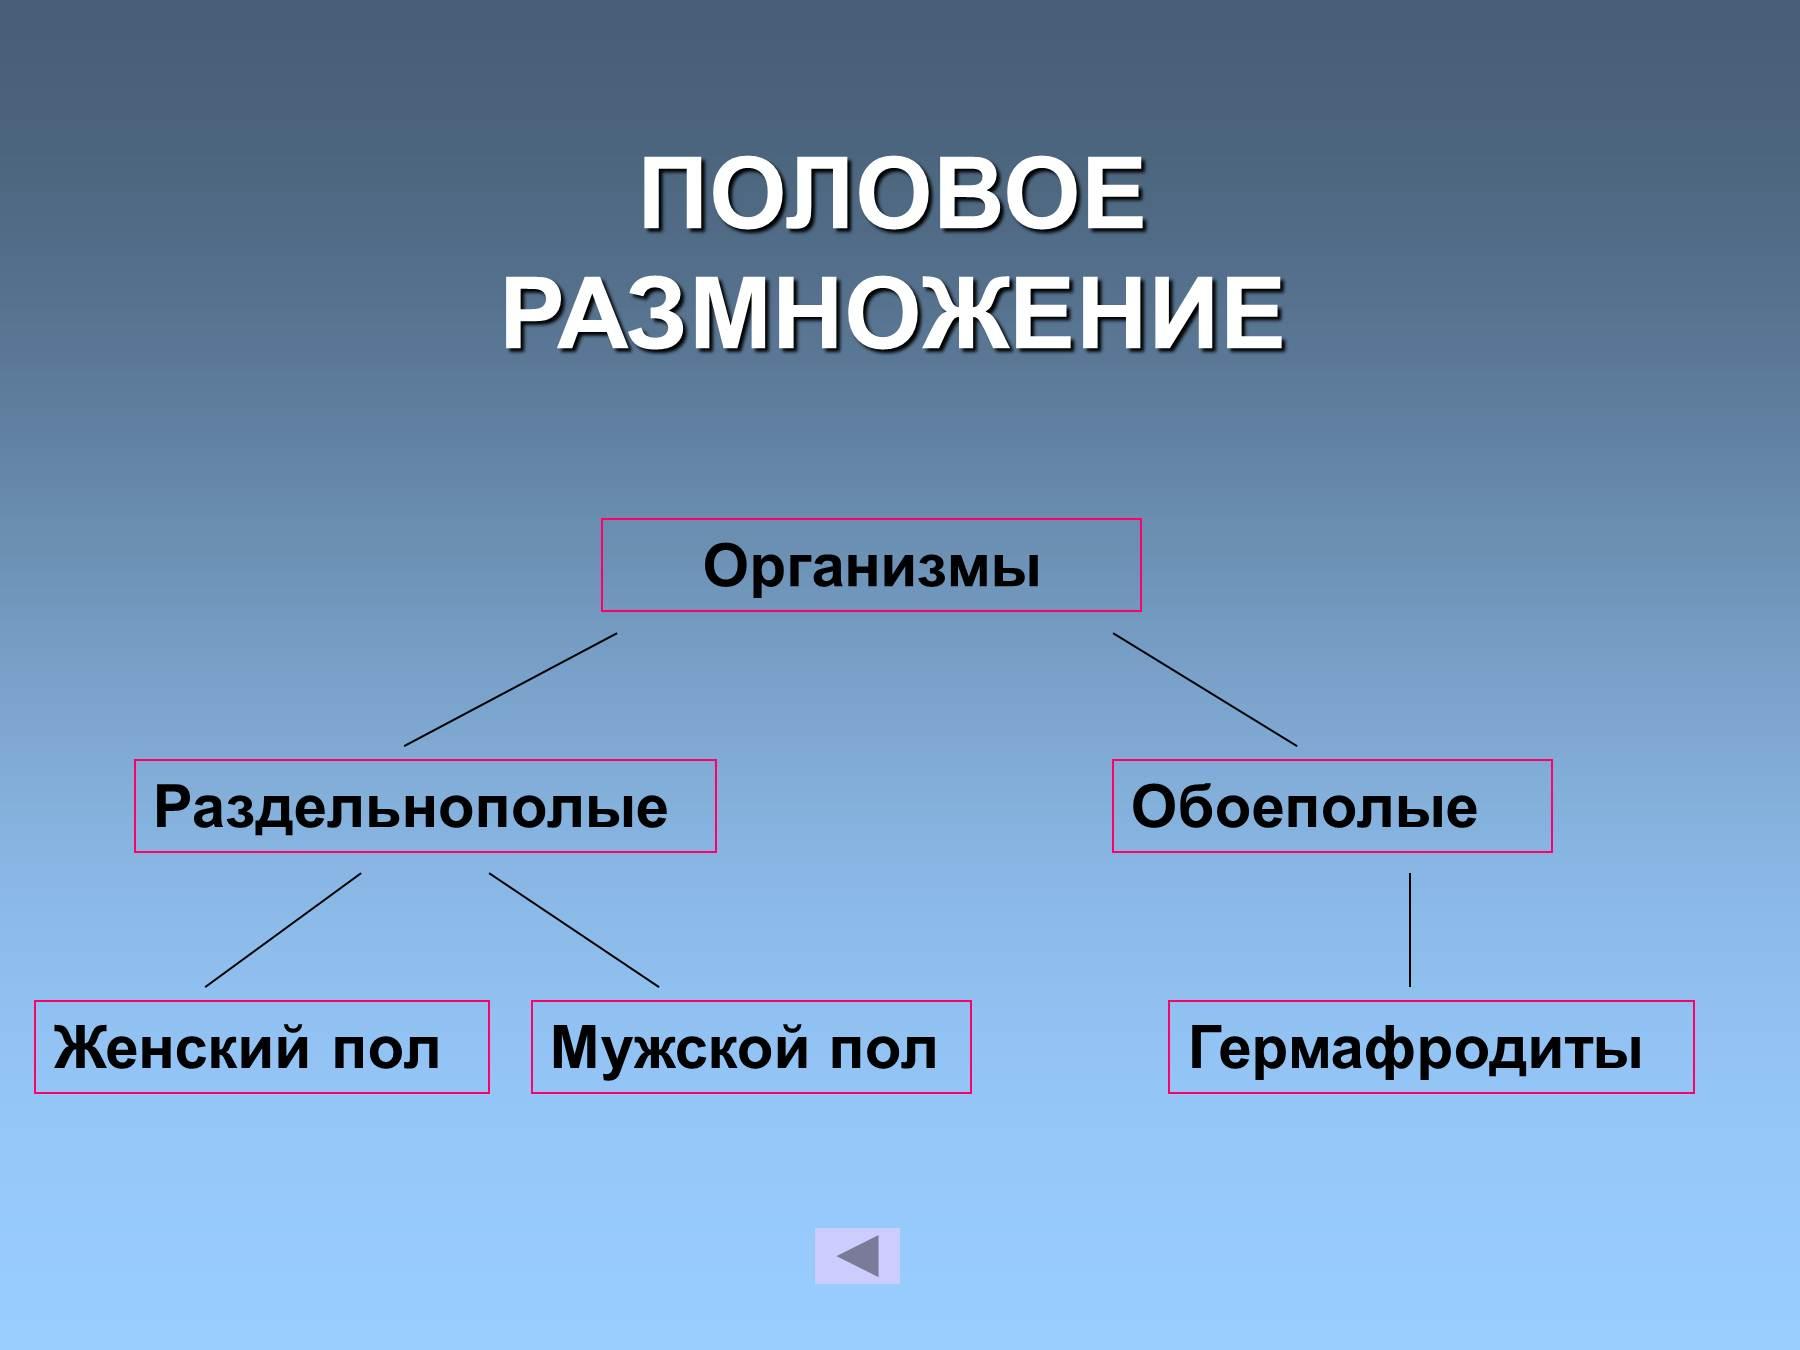 germafroditi-stroenie